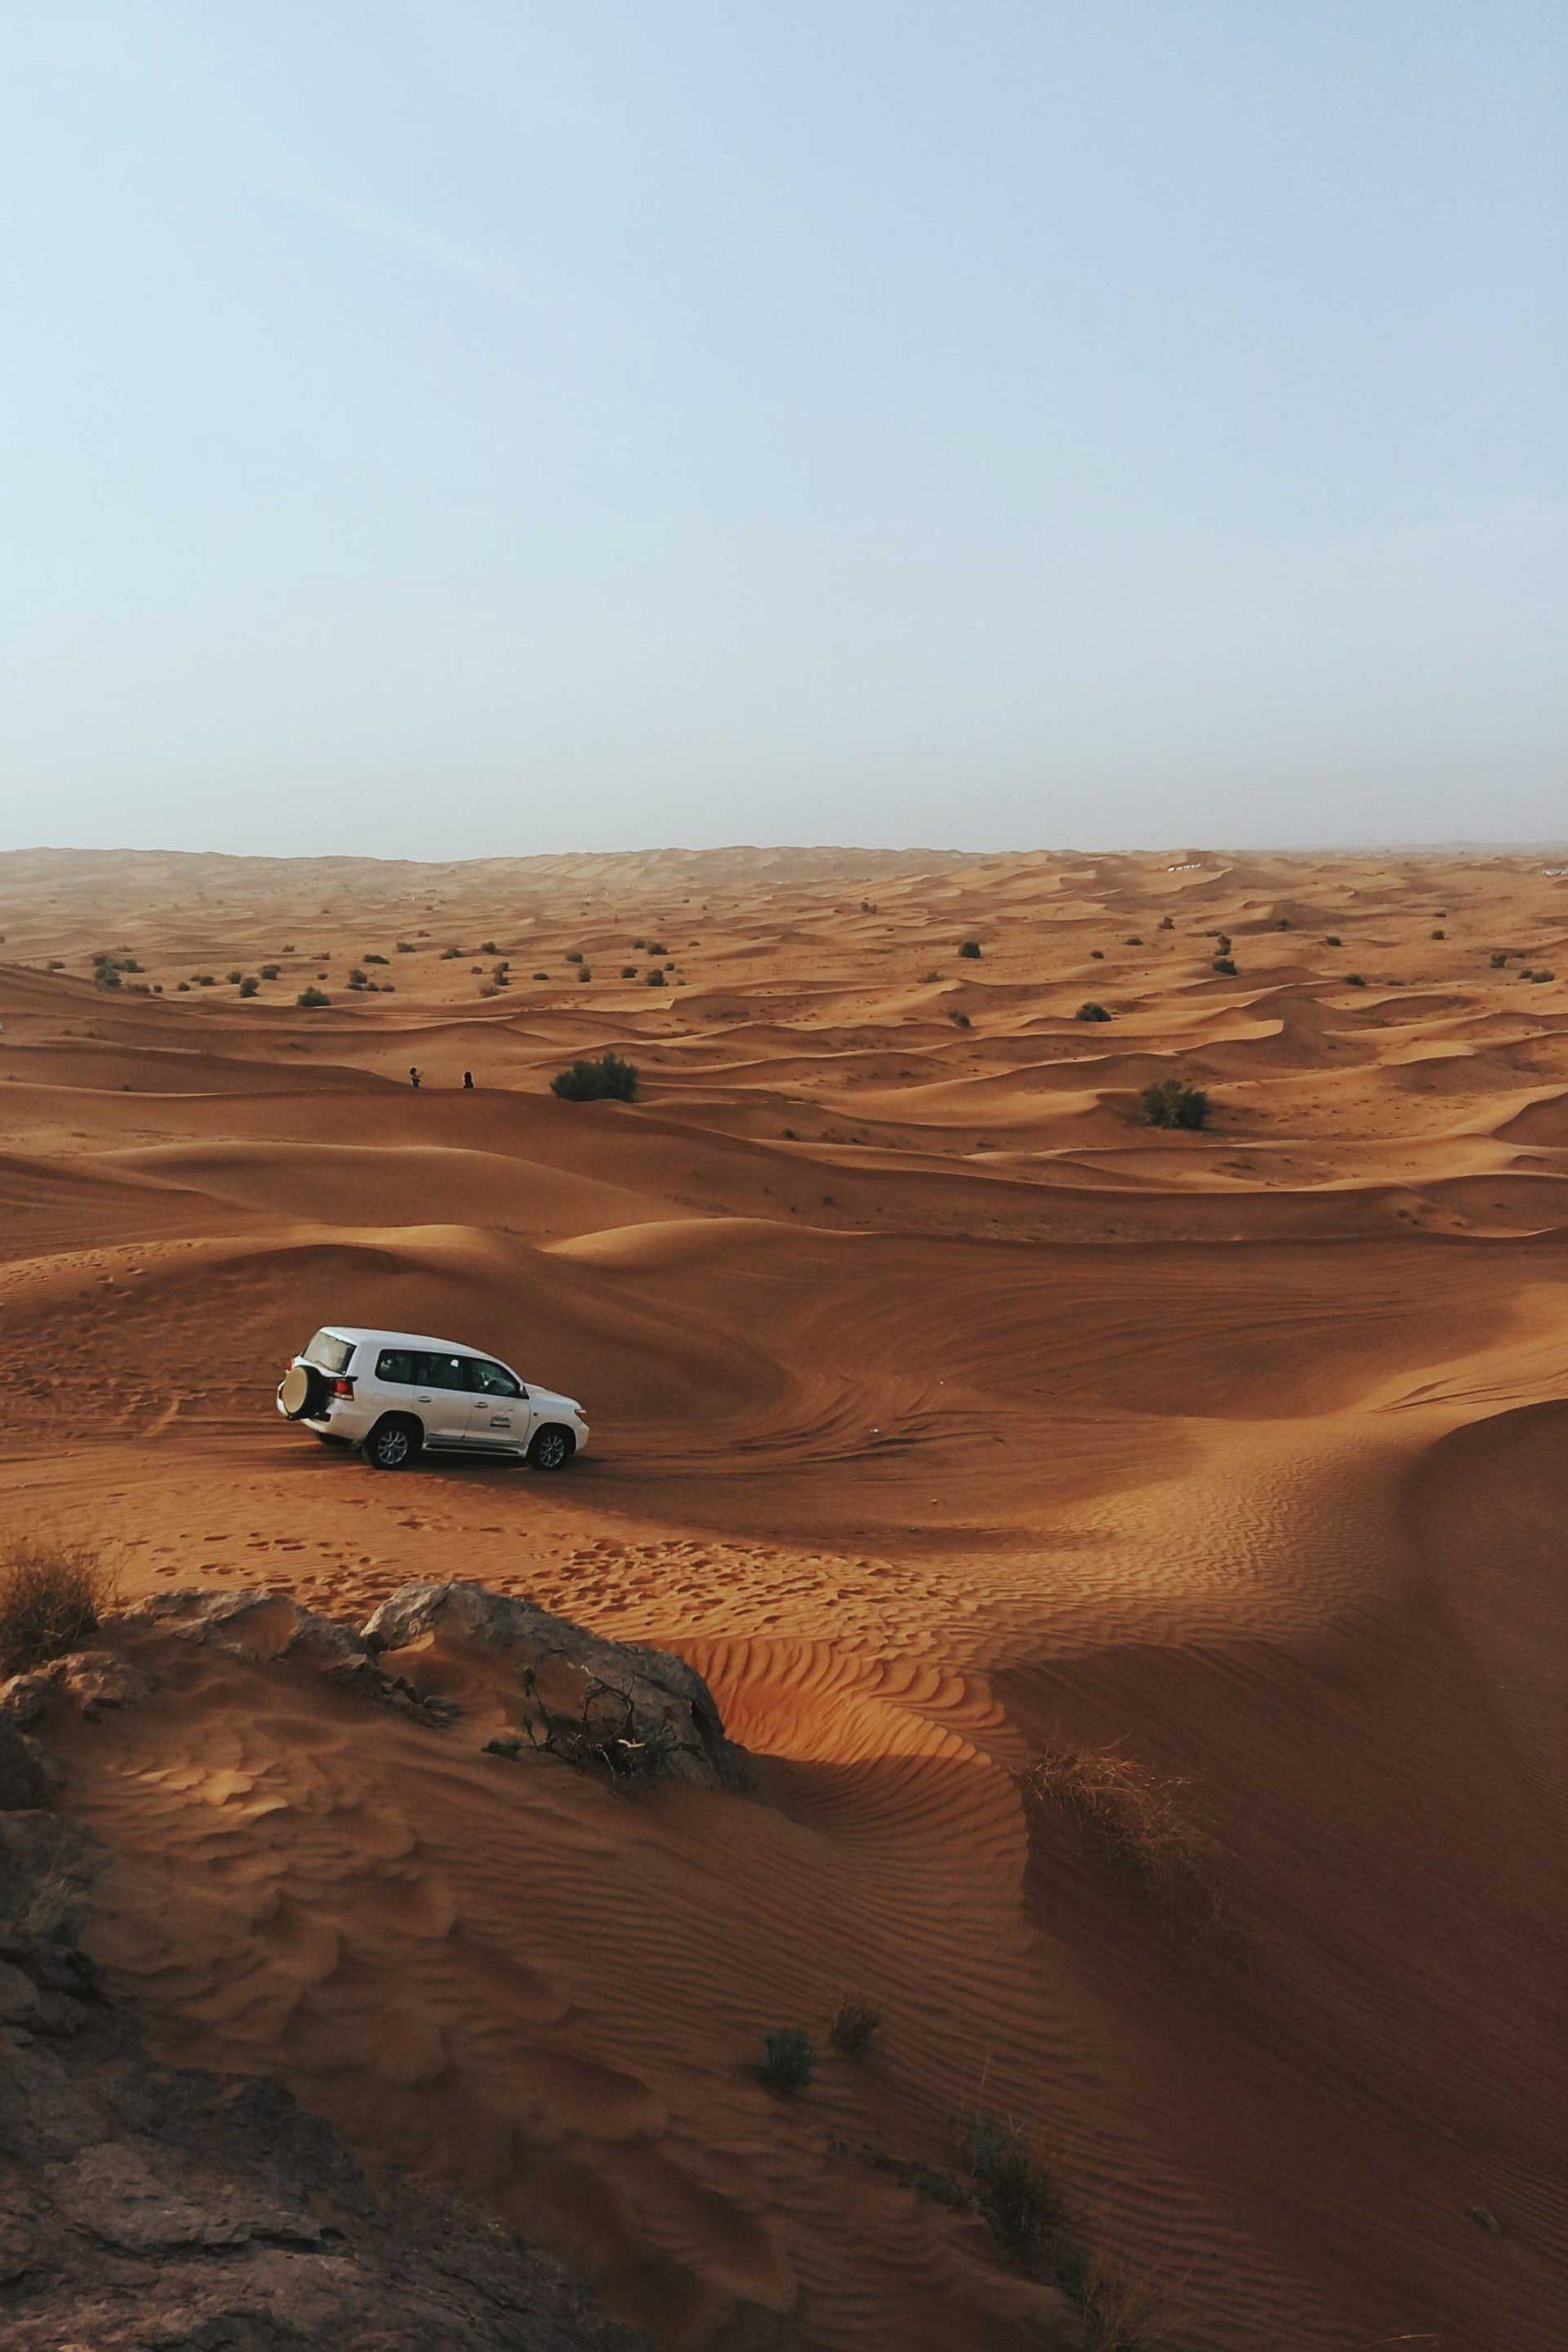 Experiencia Desert Safari 4x4 en Dubai